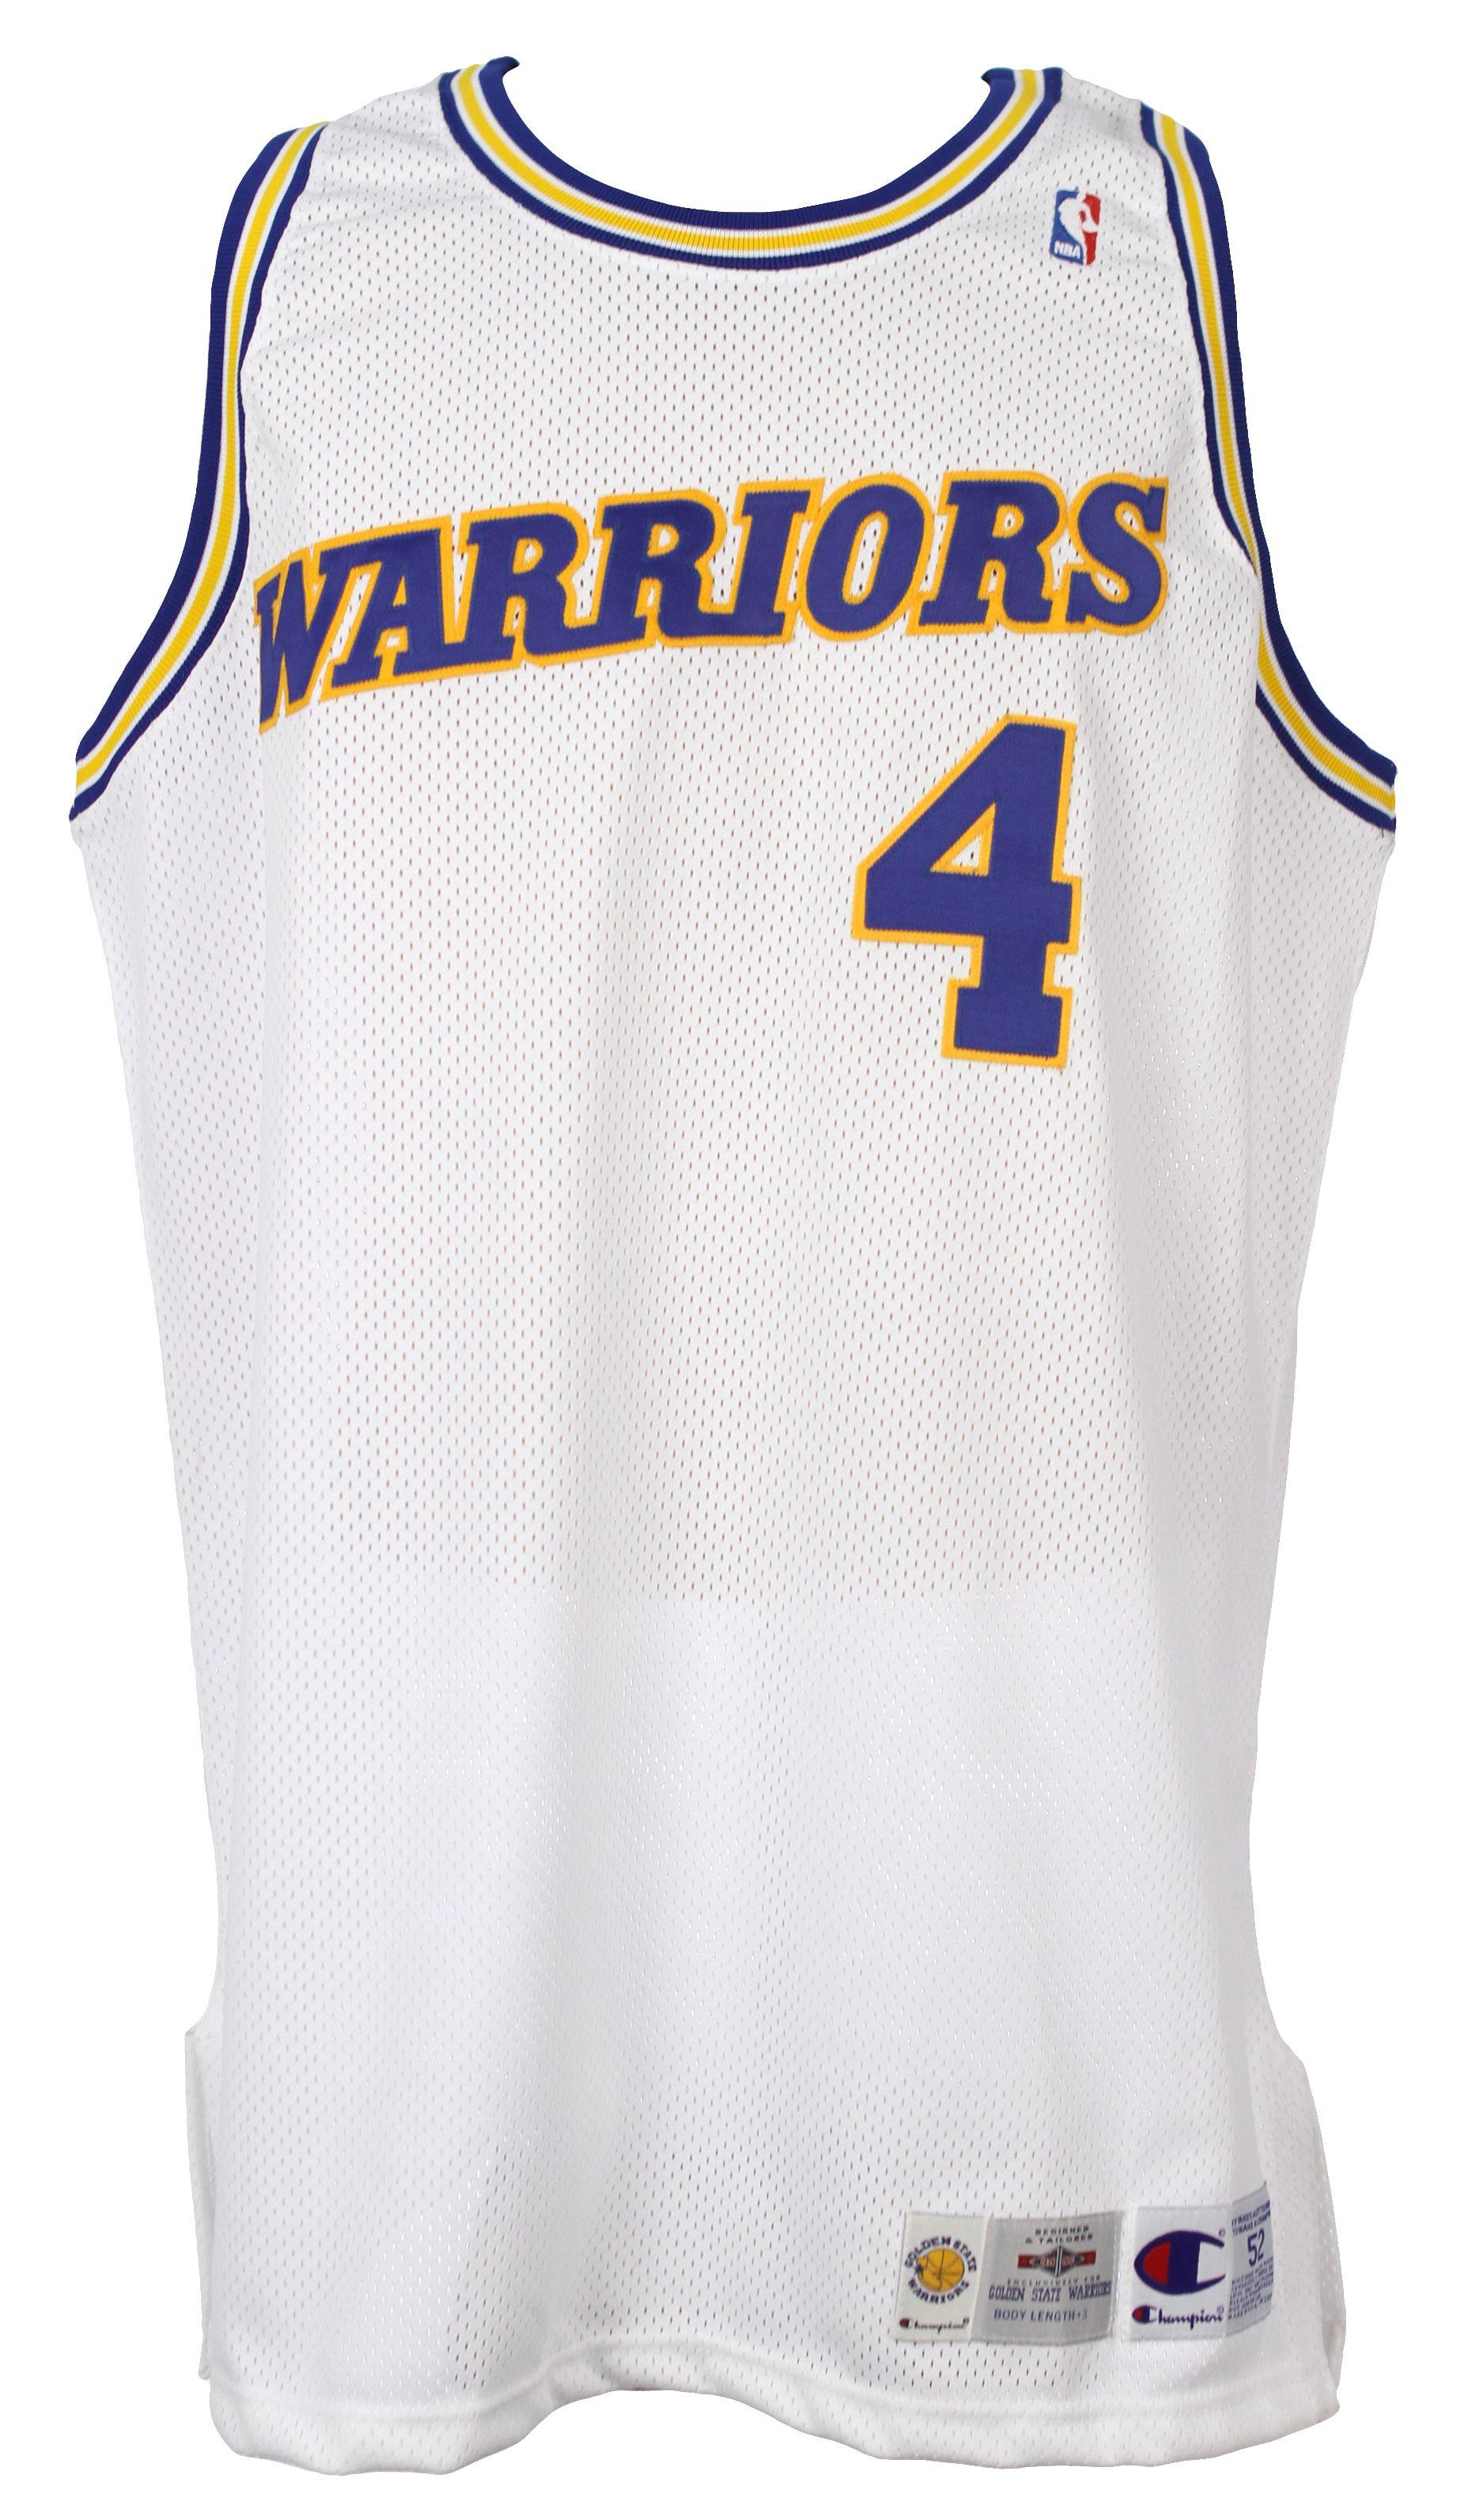 pretty nice 0ebcd cef11 Lot Detail - 1994-95 Chris Webber Golden State Warriors Game ...